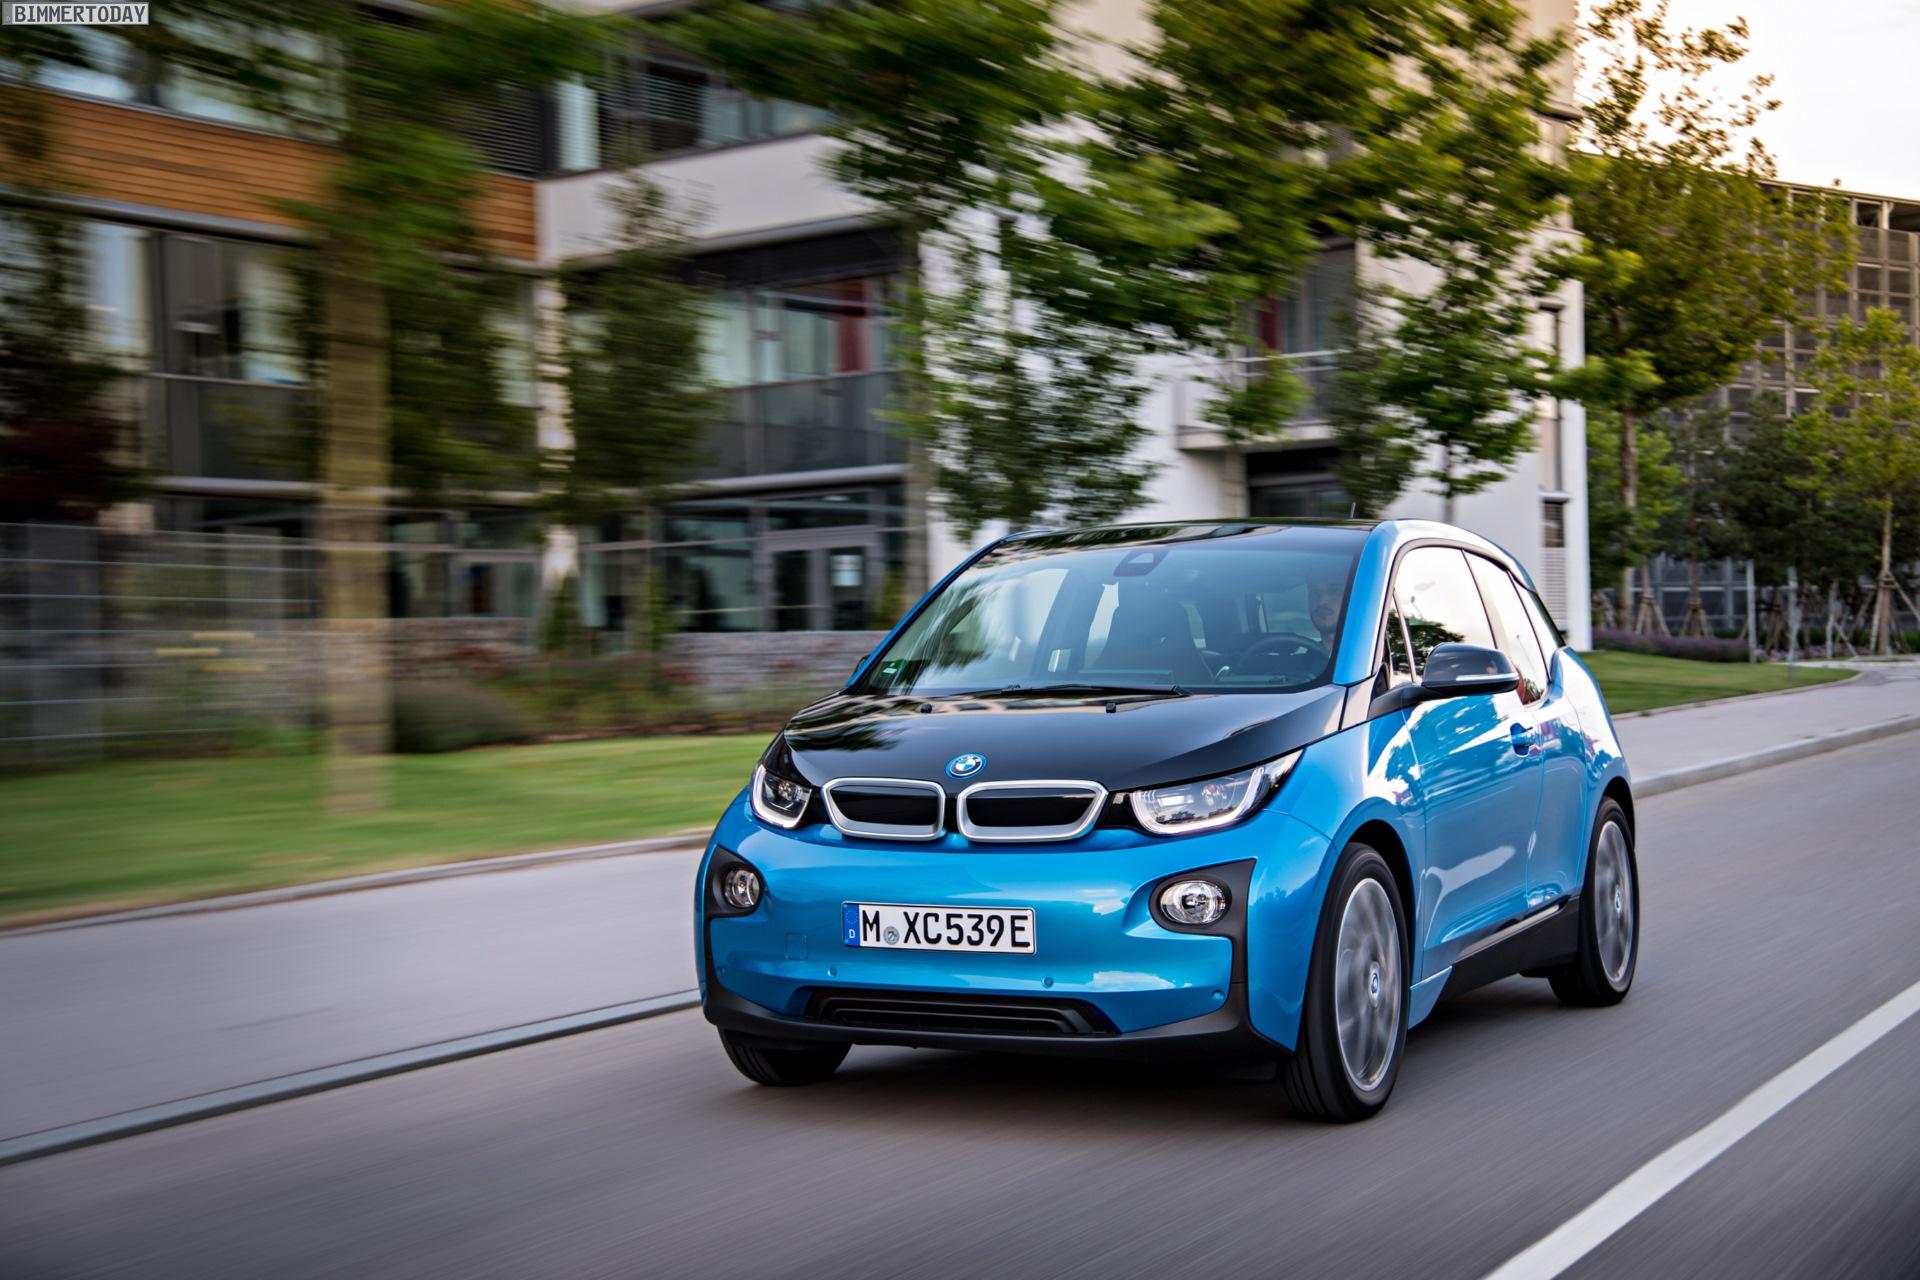 2016 BMW i3 94Ah Protonic Blue 33 kWh Elektroauto 18